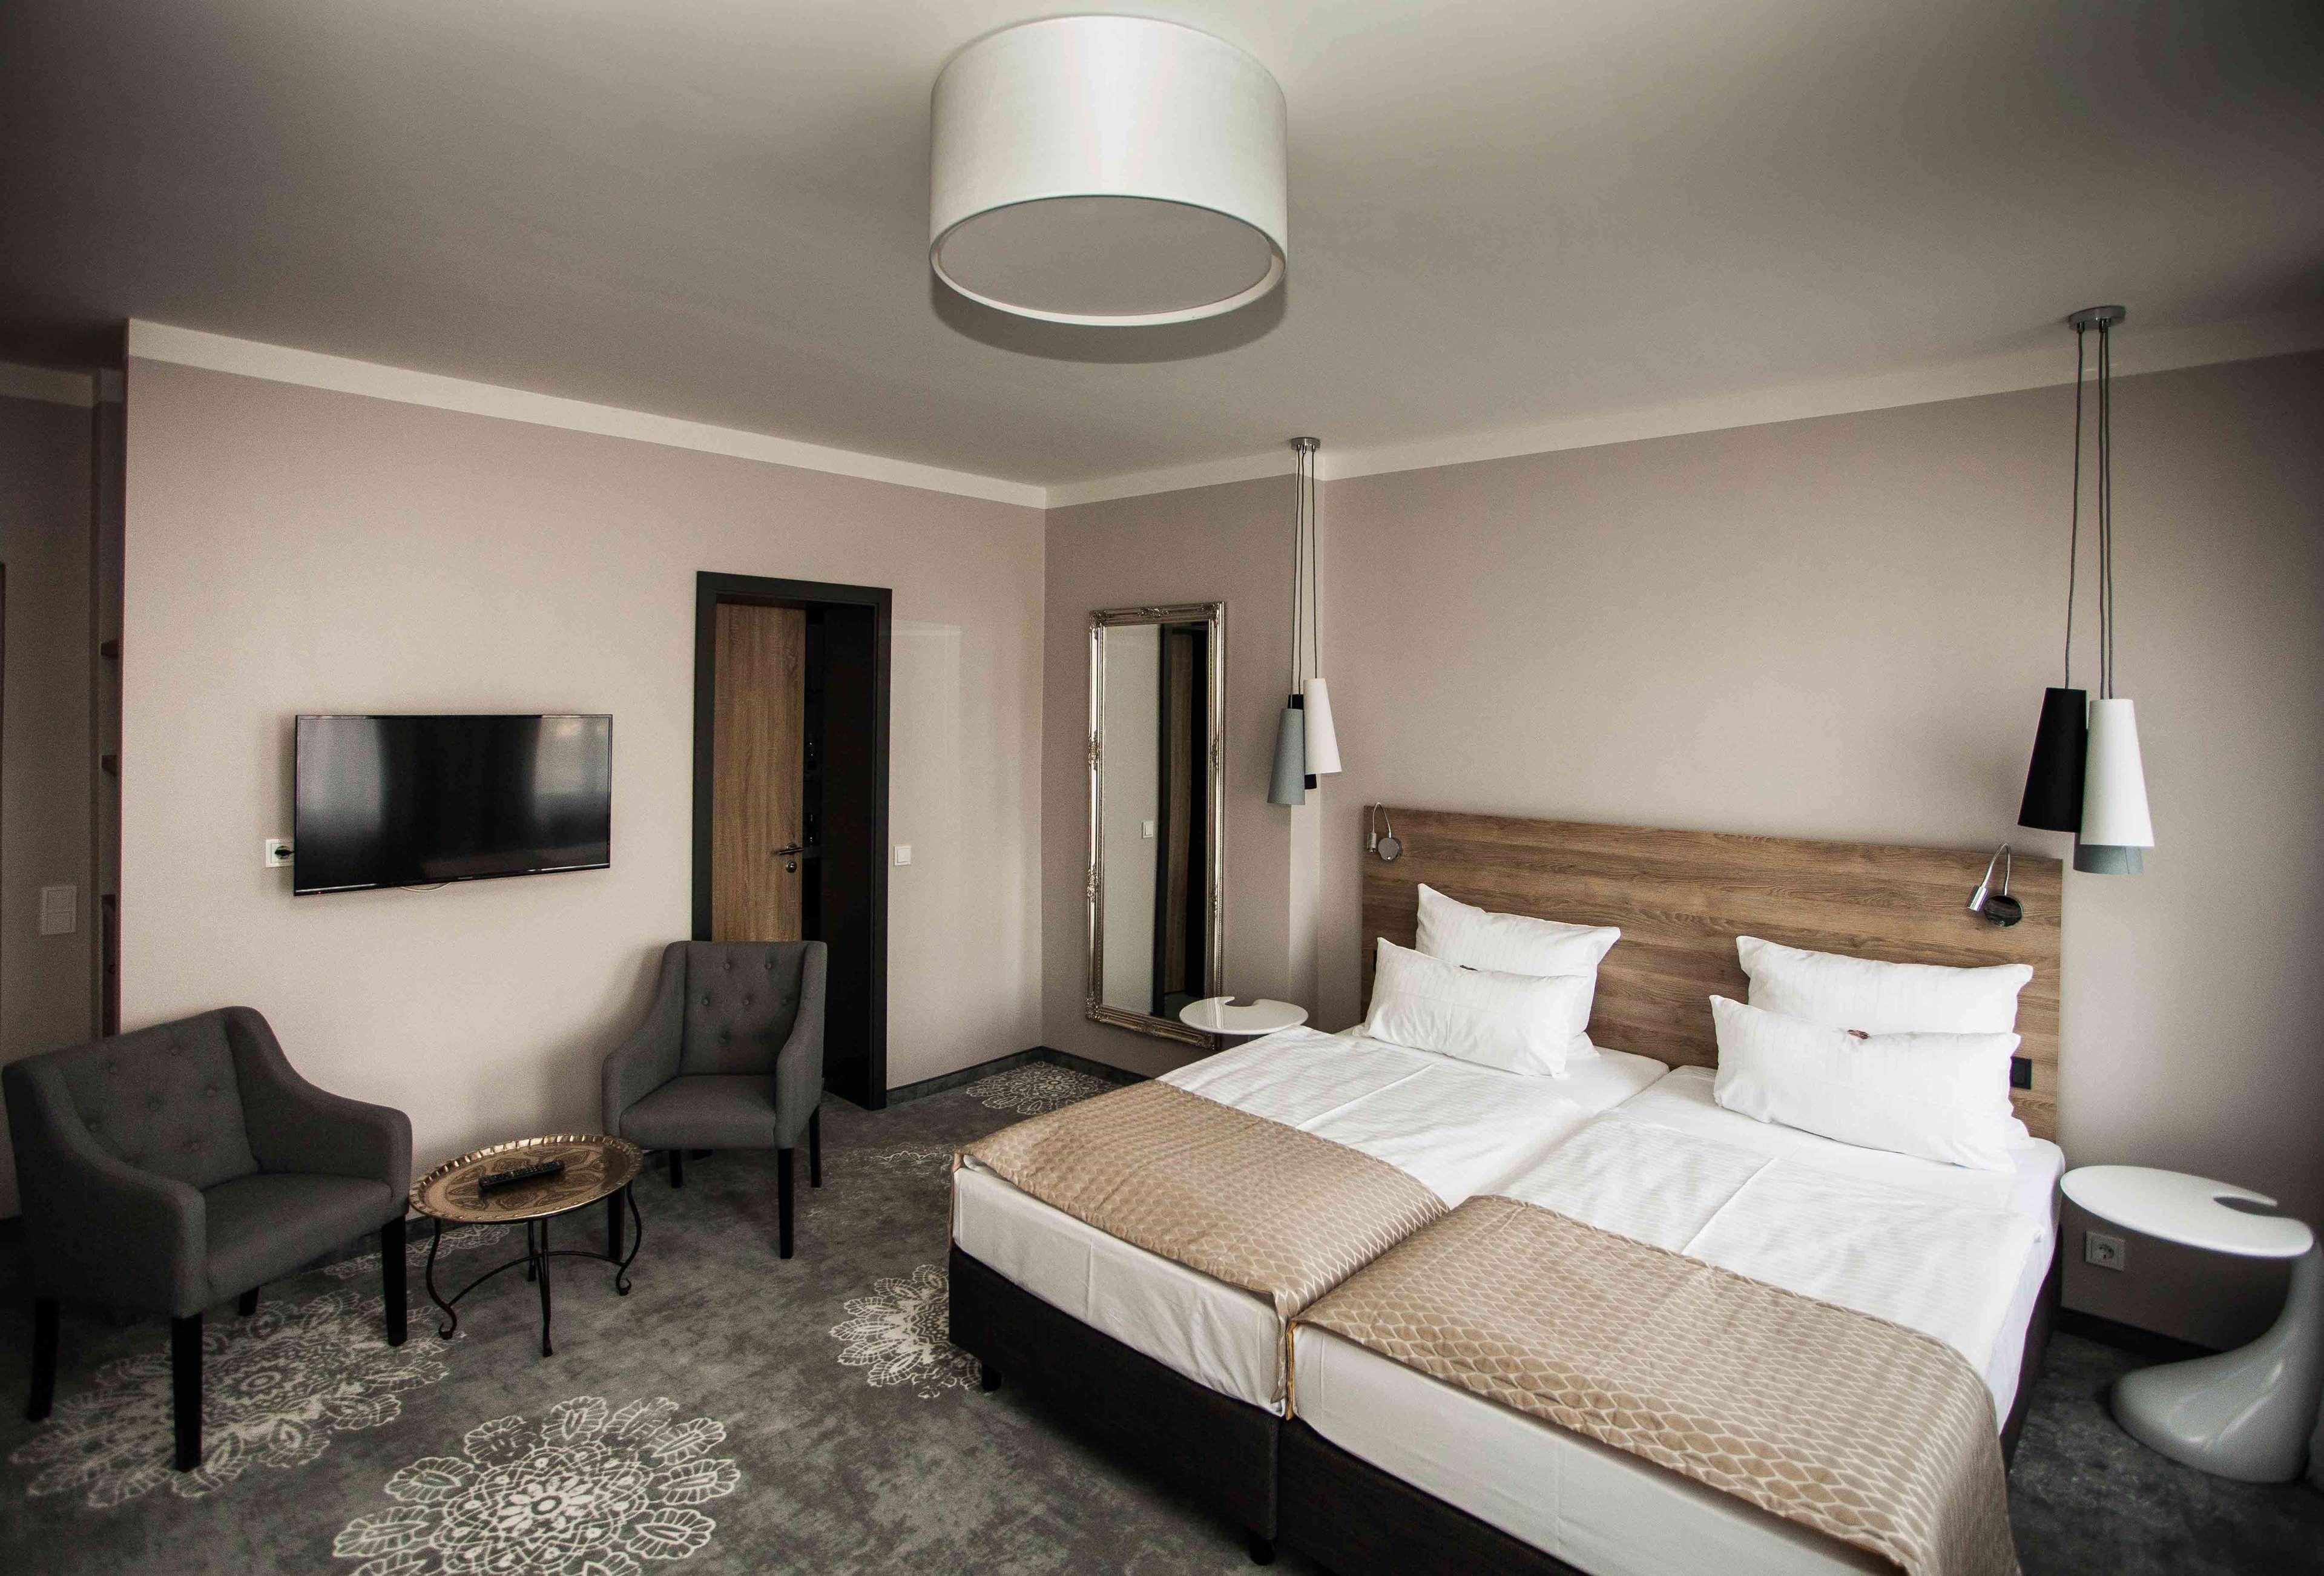 best western hotel via regia hotels hotels restaurants goerlitz deutschland tel. Black Bedroom Furniture Sets. Home Design Ideas